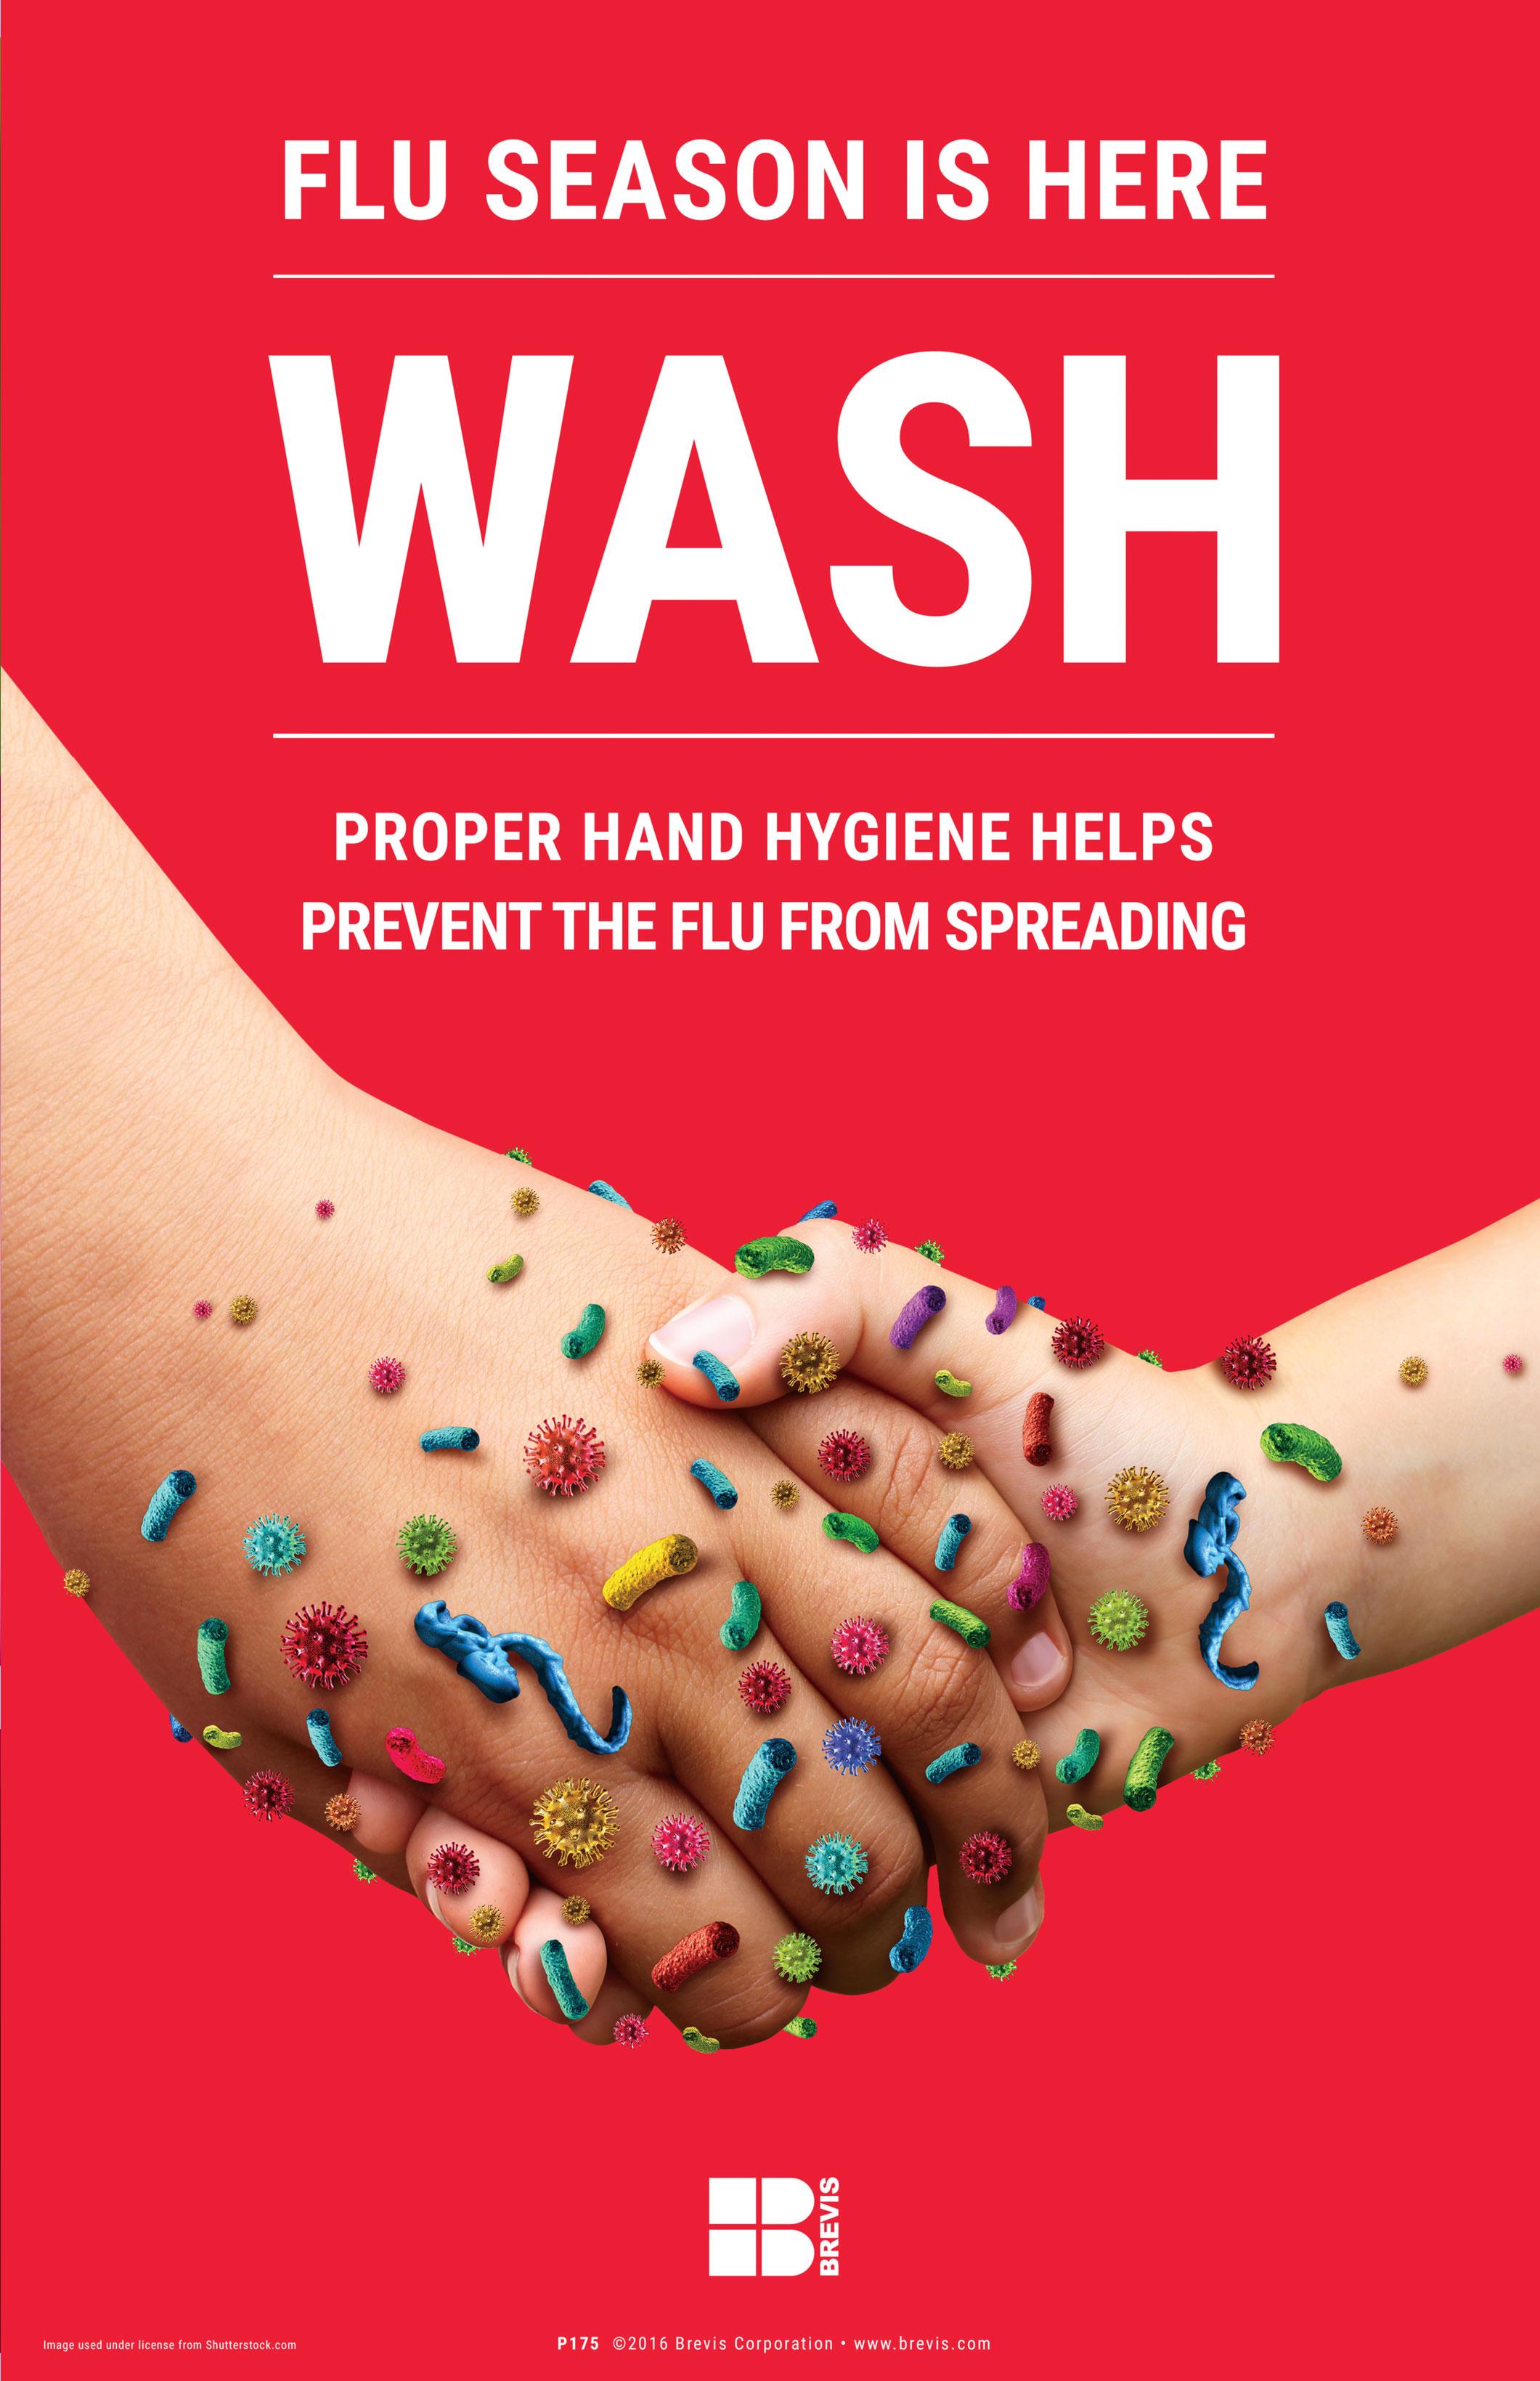 Wash Hand Hygiene Prevents Flu Poster 11x17 Brevis